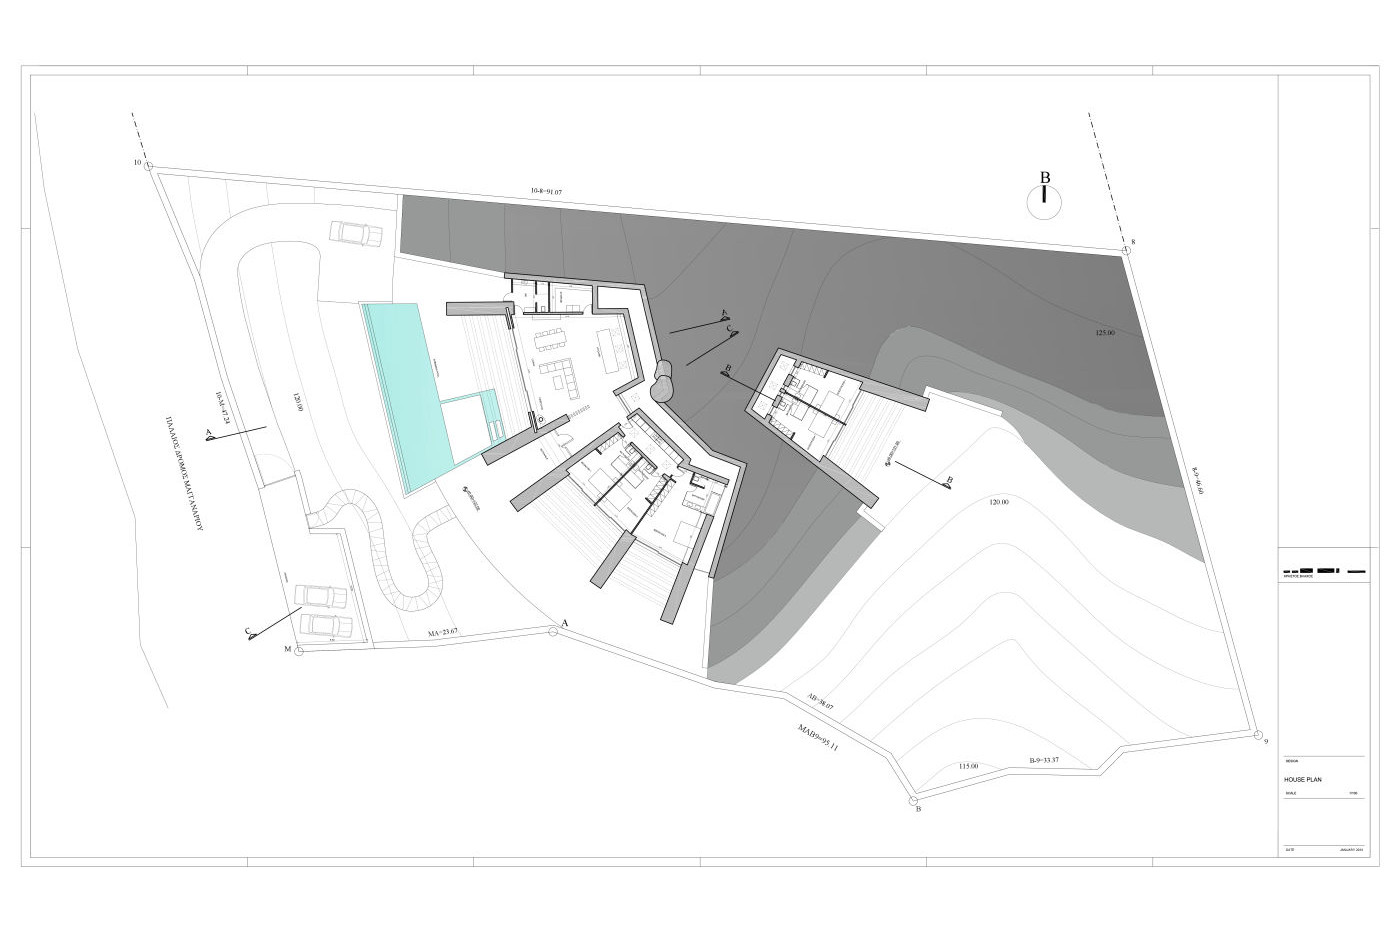 014-villa-a-house-plan-1400x990.jpg